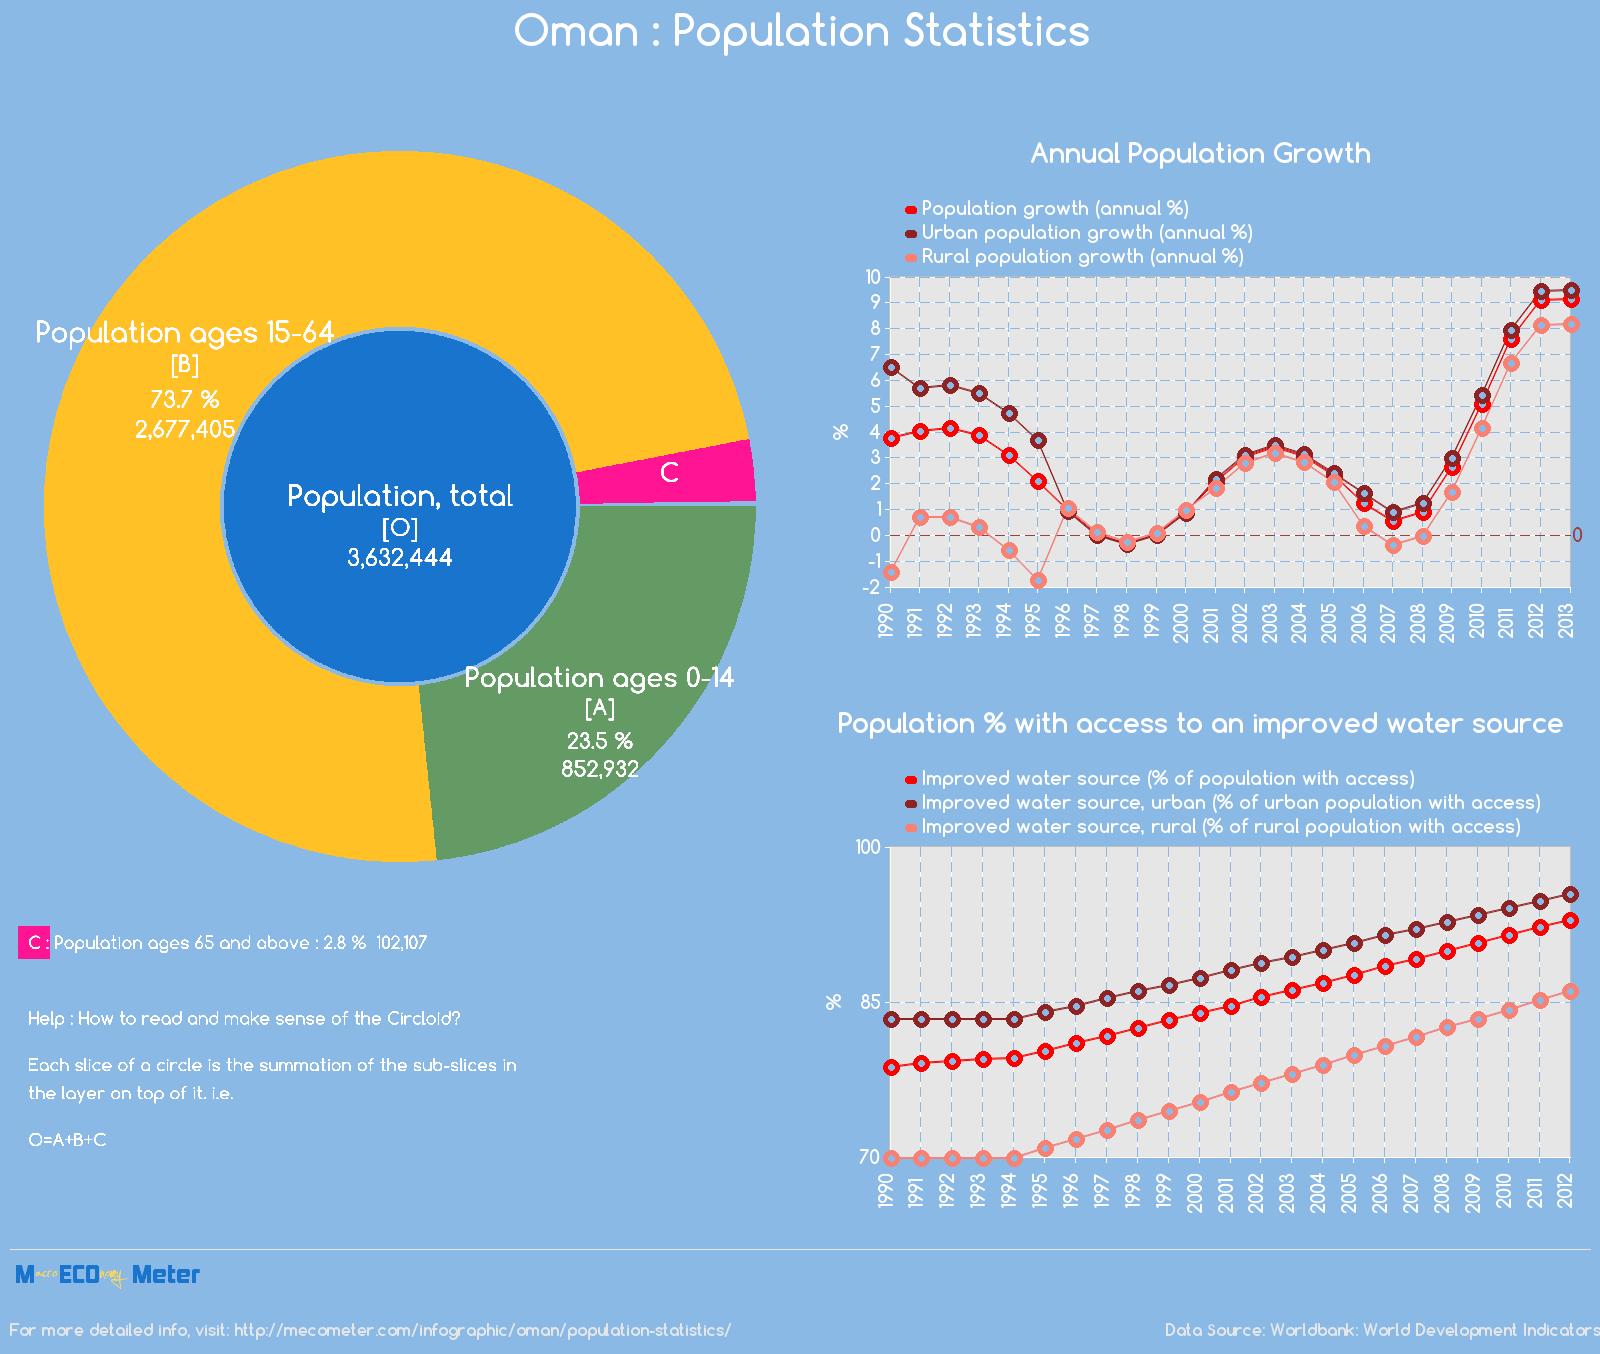 Oman : Population Statistics